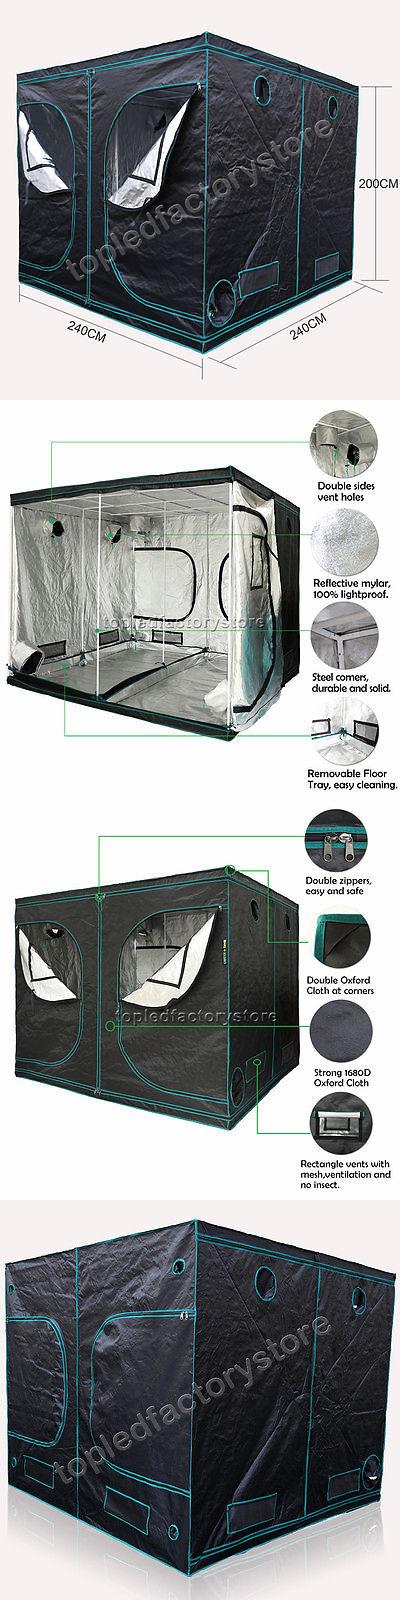 Tents Tarps and Shelves 178993 8 X8 X7 Mars Indoor Grow Tent Room Box Hut & Tents Tarps and Shelves 178993: 8 X8 X7 Mars Indoor Grow Tent Room ...